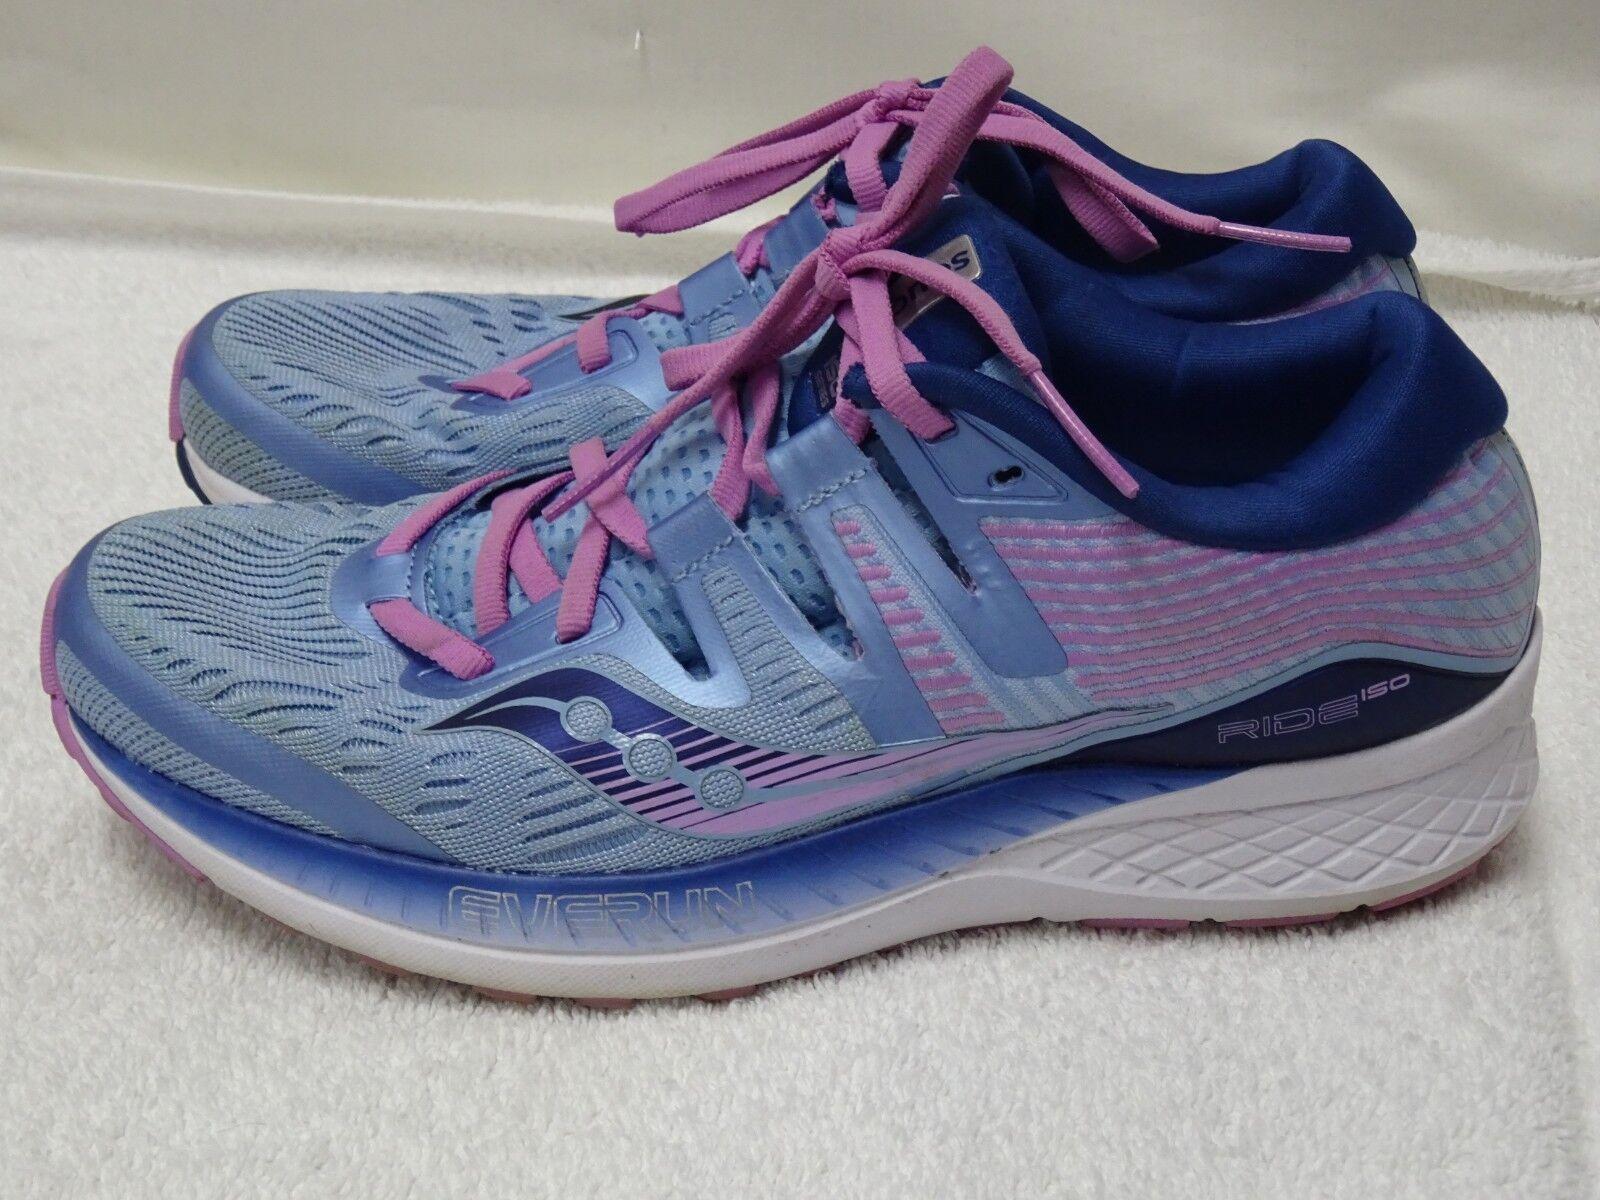 Saucony S10441-1 Women's Ride ISO Running shoes US Sz 8.5